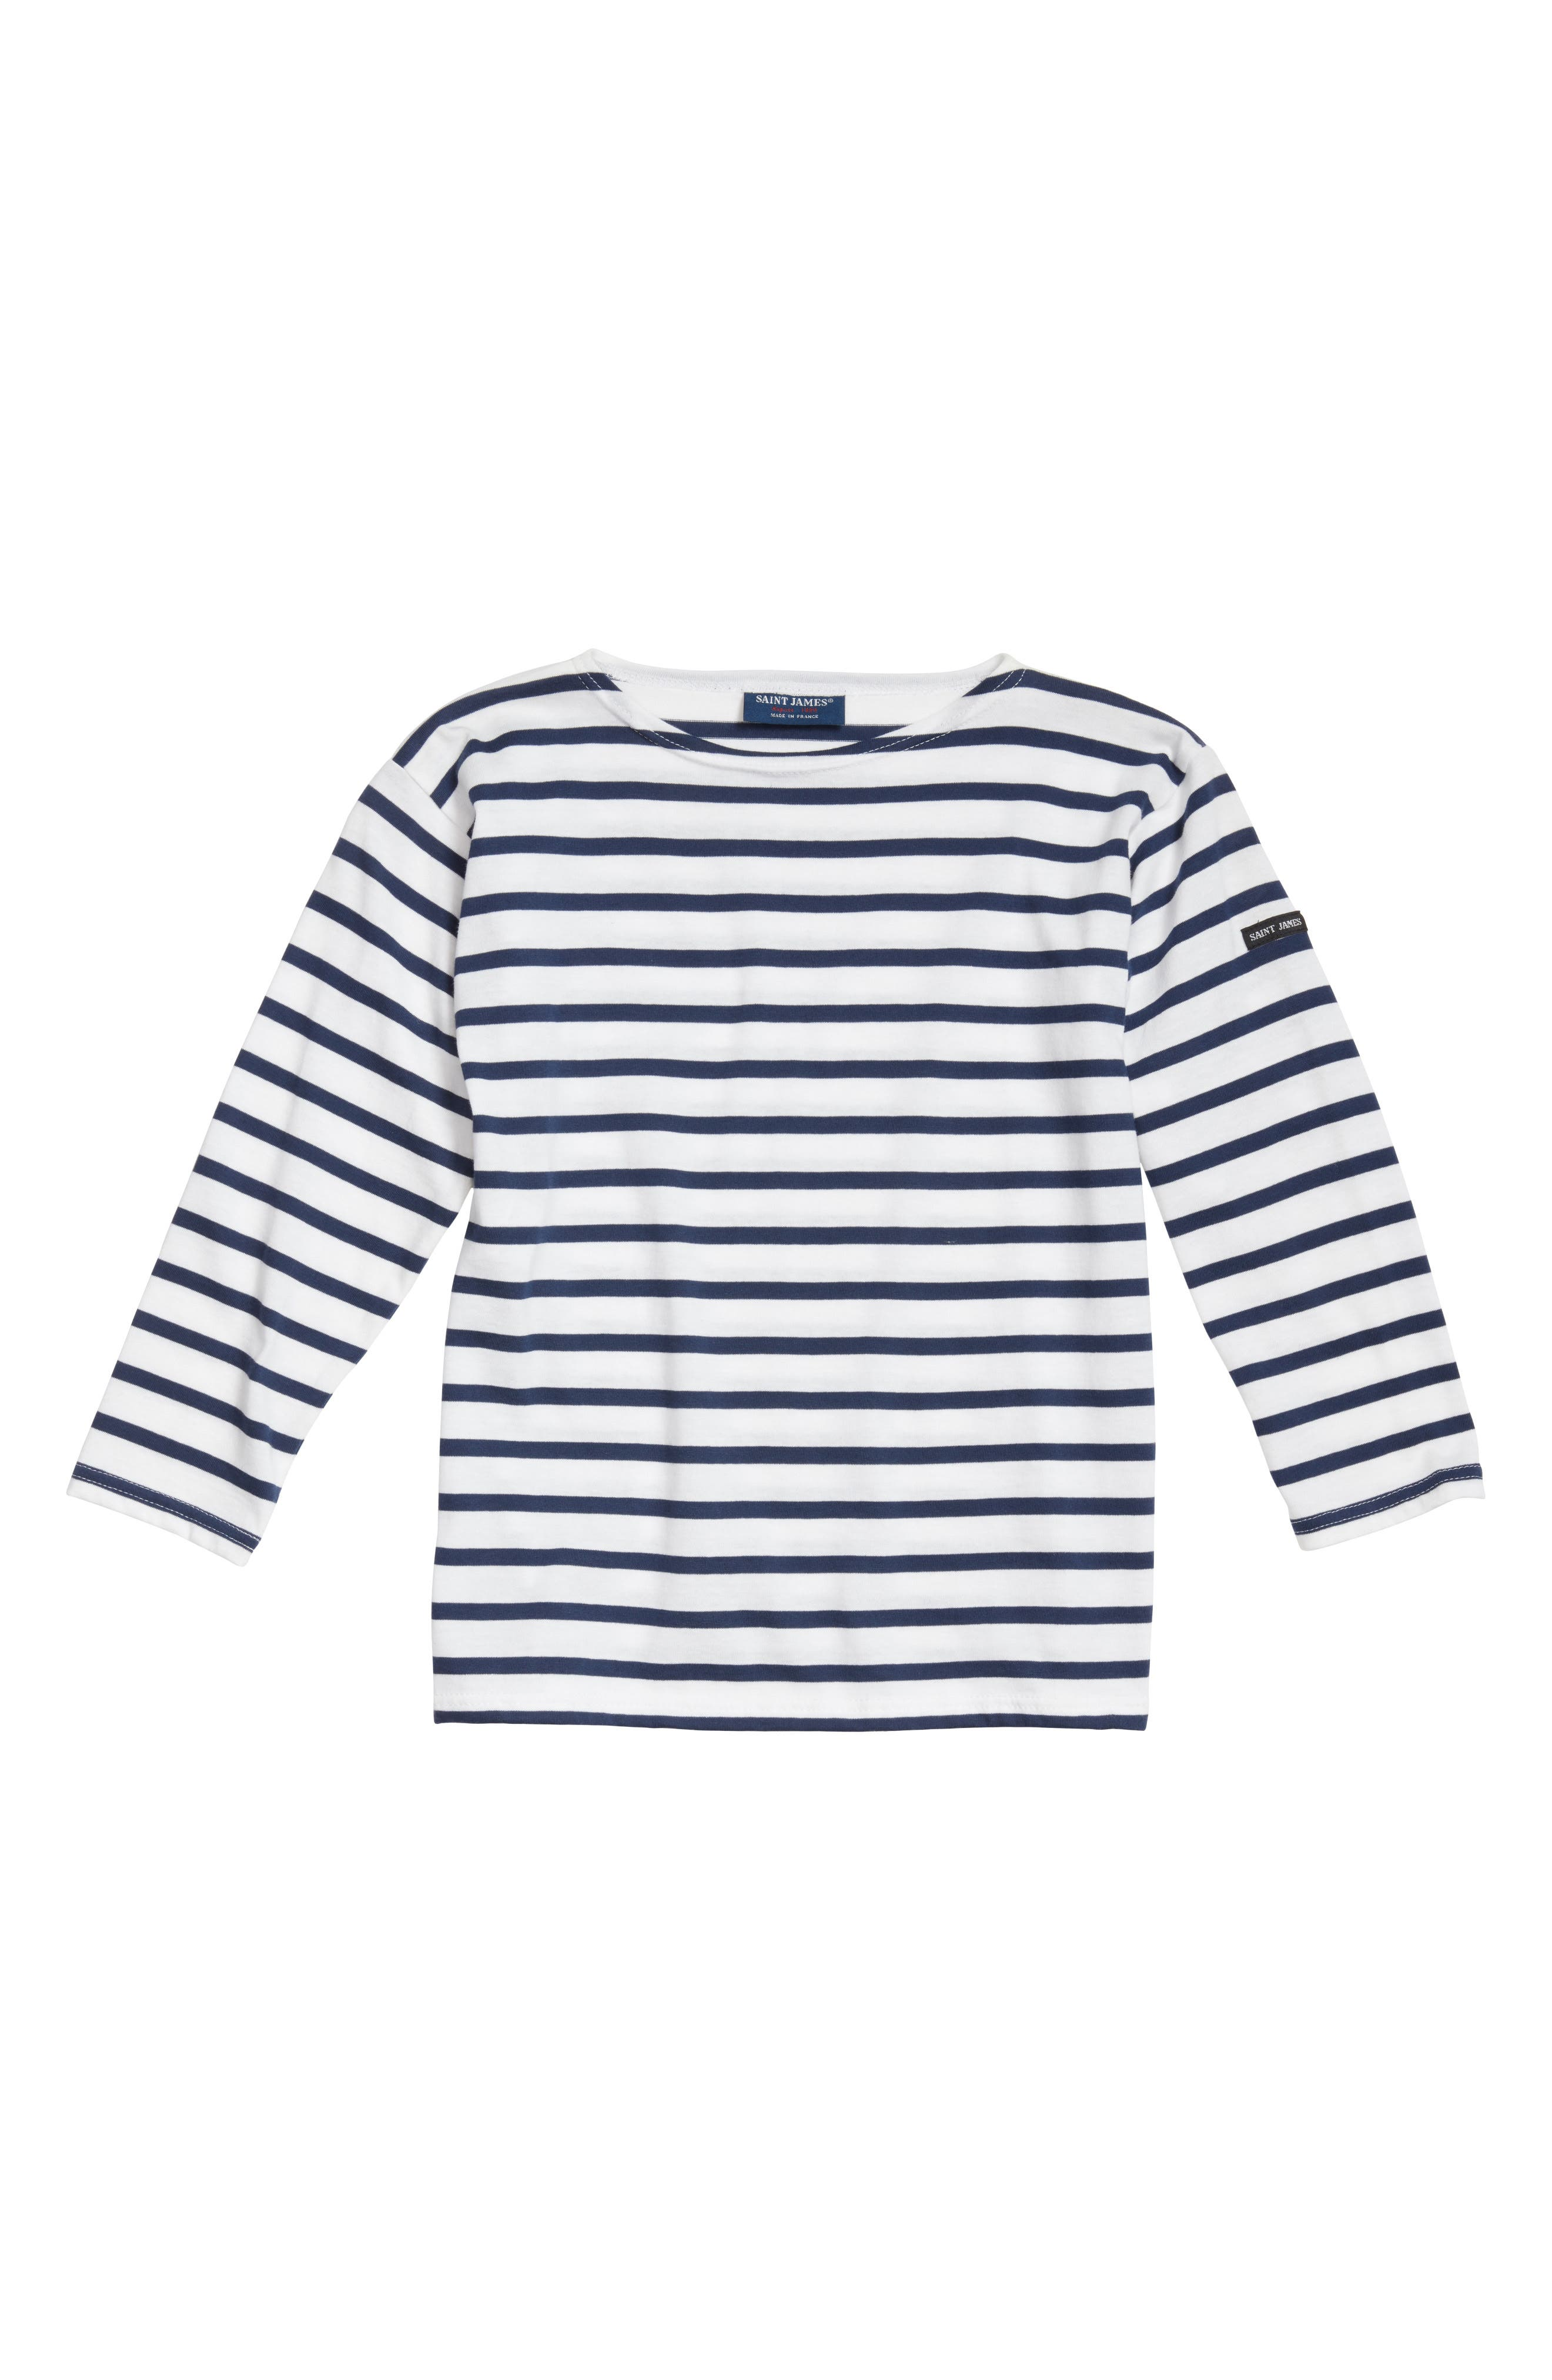 Main Image - Saint James Minquiers Kids Striped Sailor Shirt (Toddlers, Little Kids & Big Kids)